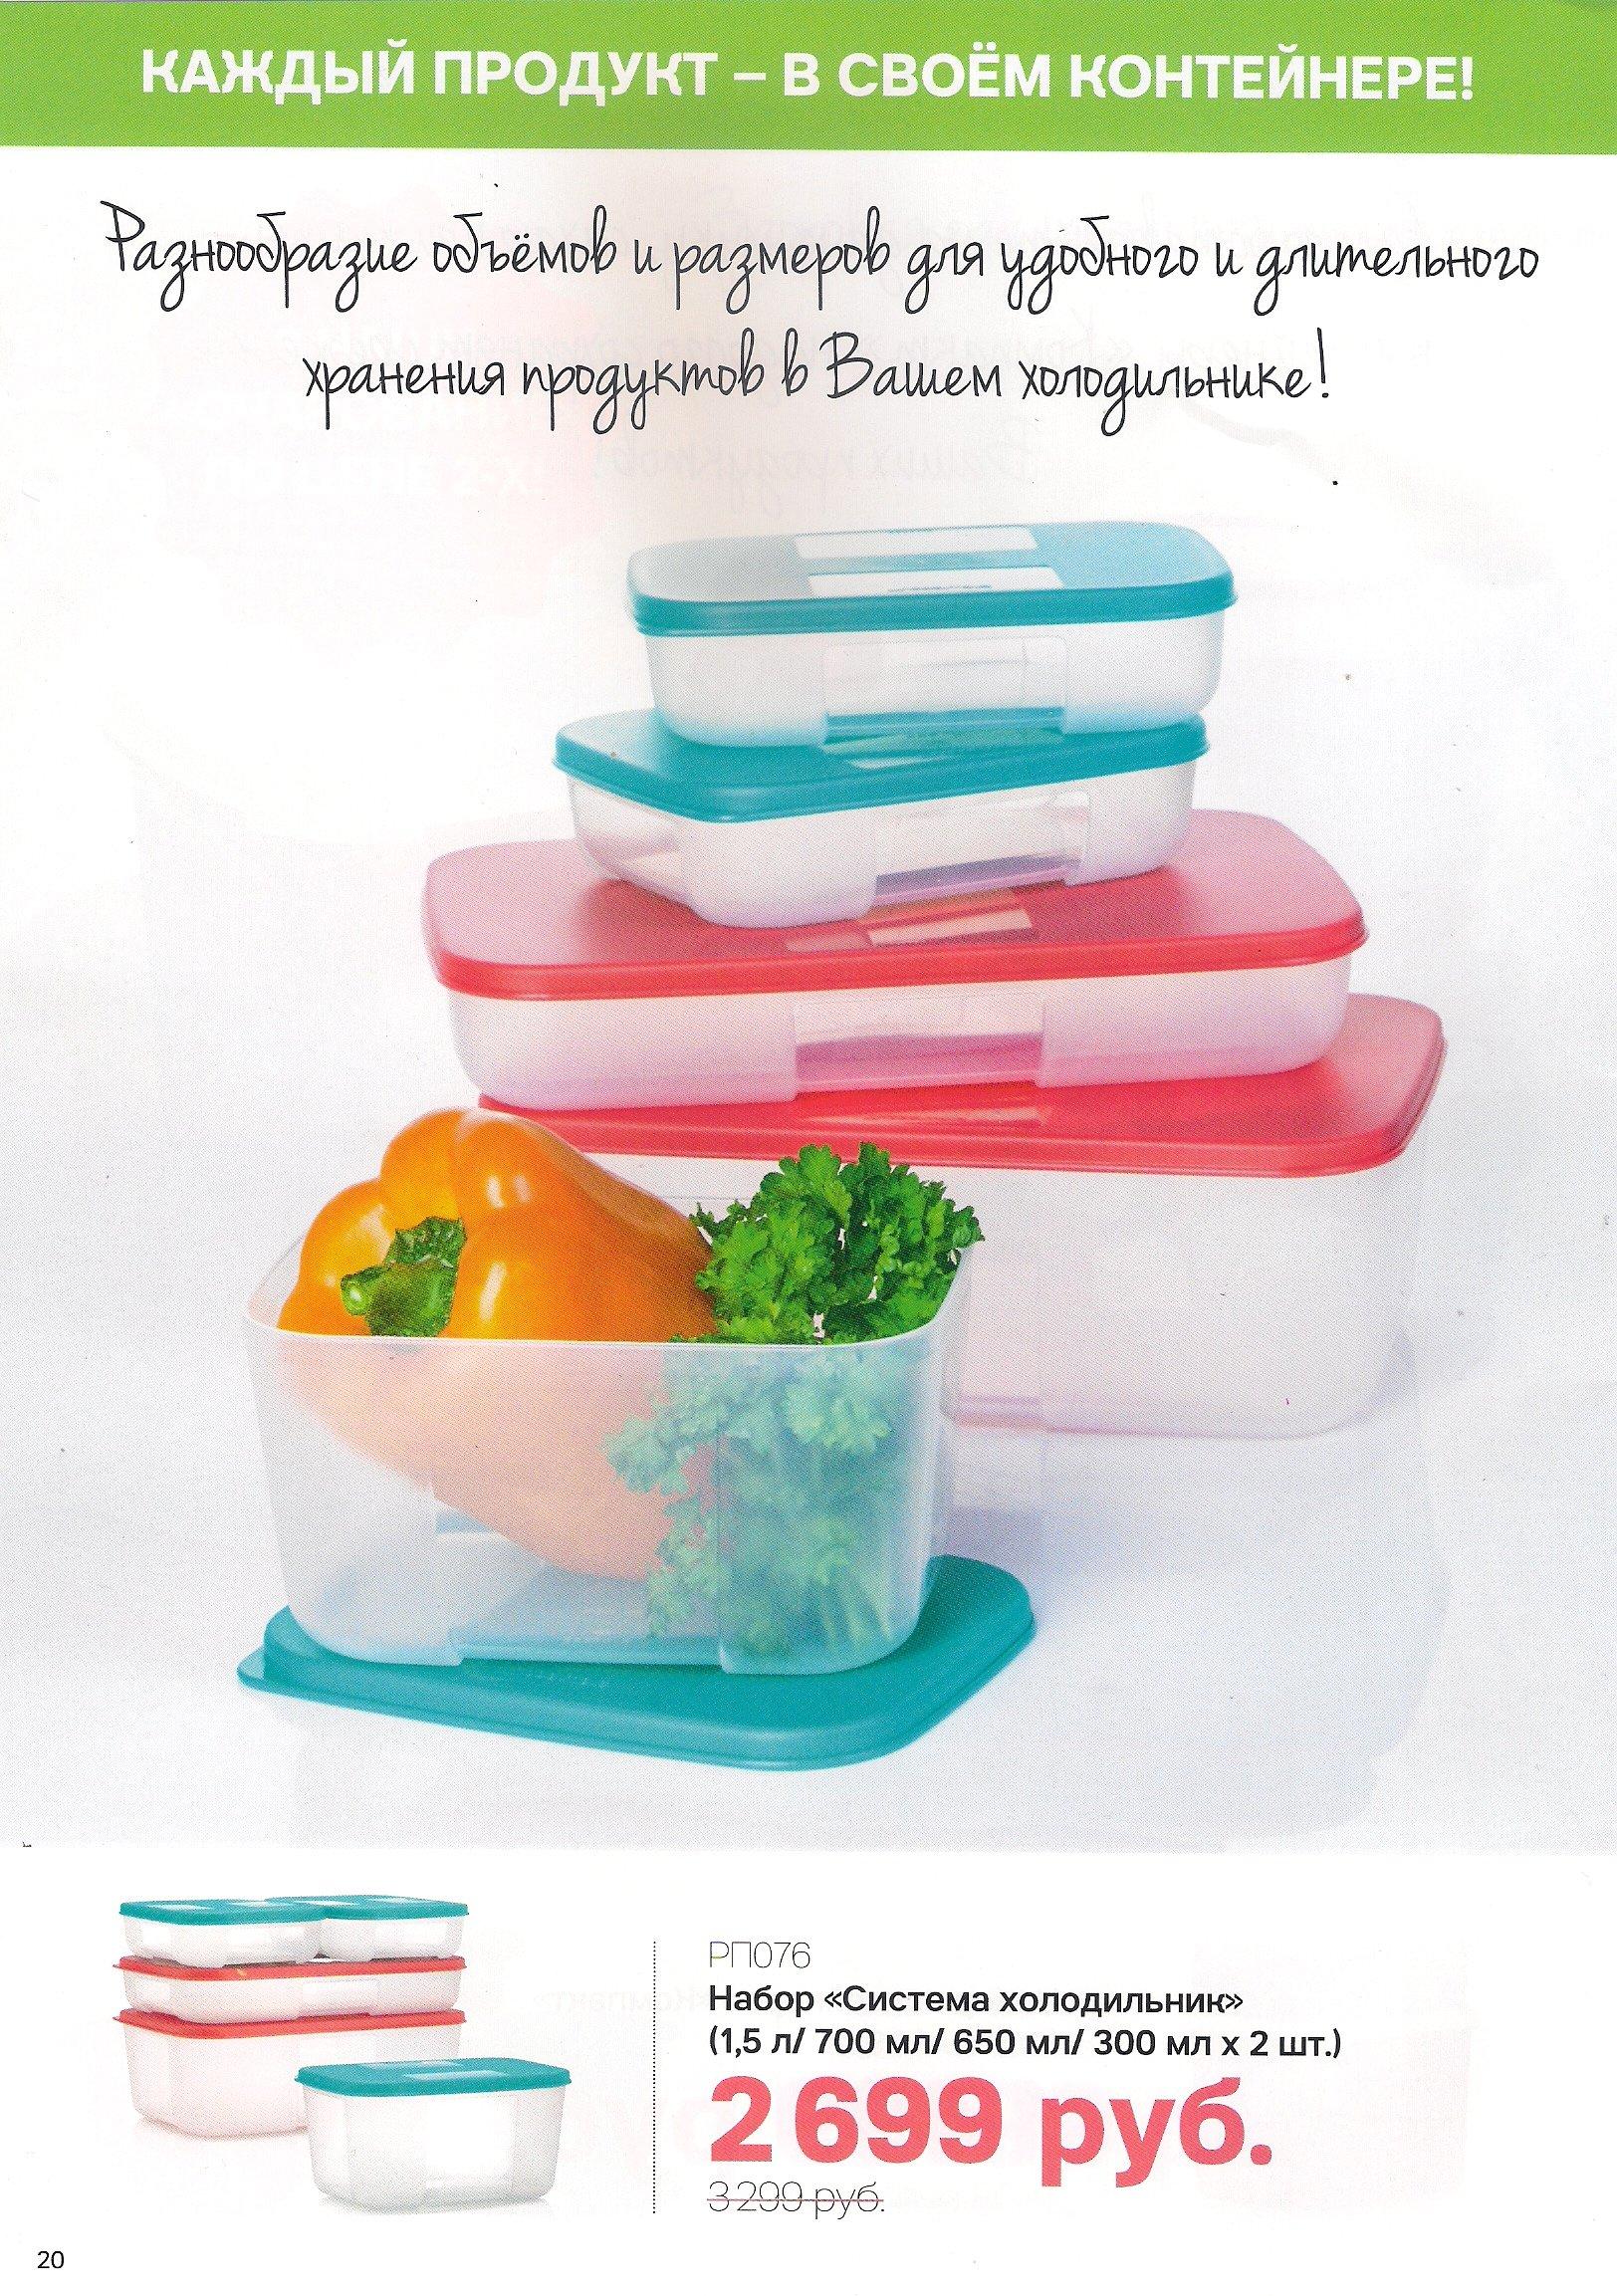 http://tupperware-online.ru/images/upload/20i.jpg